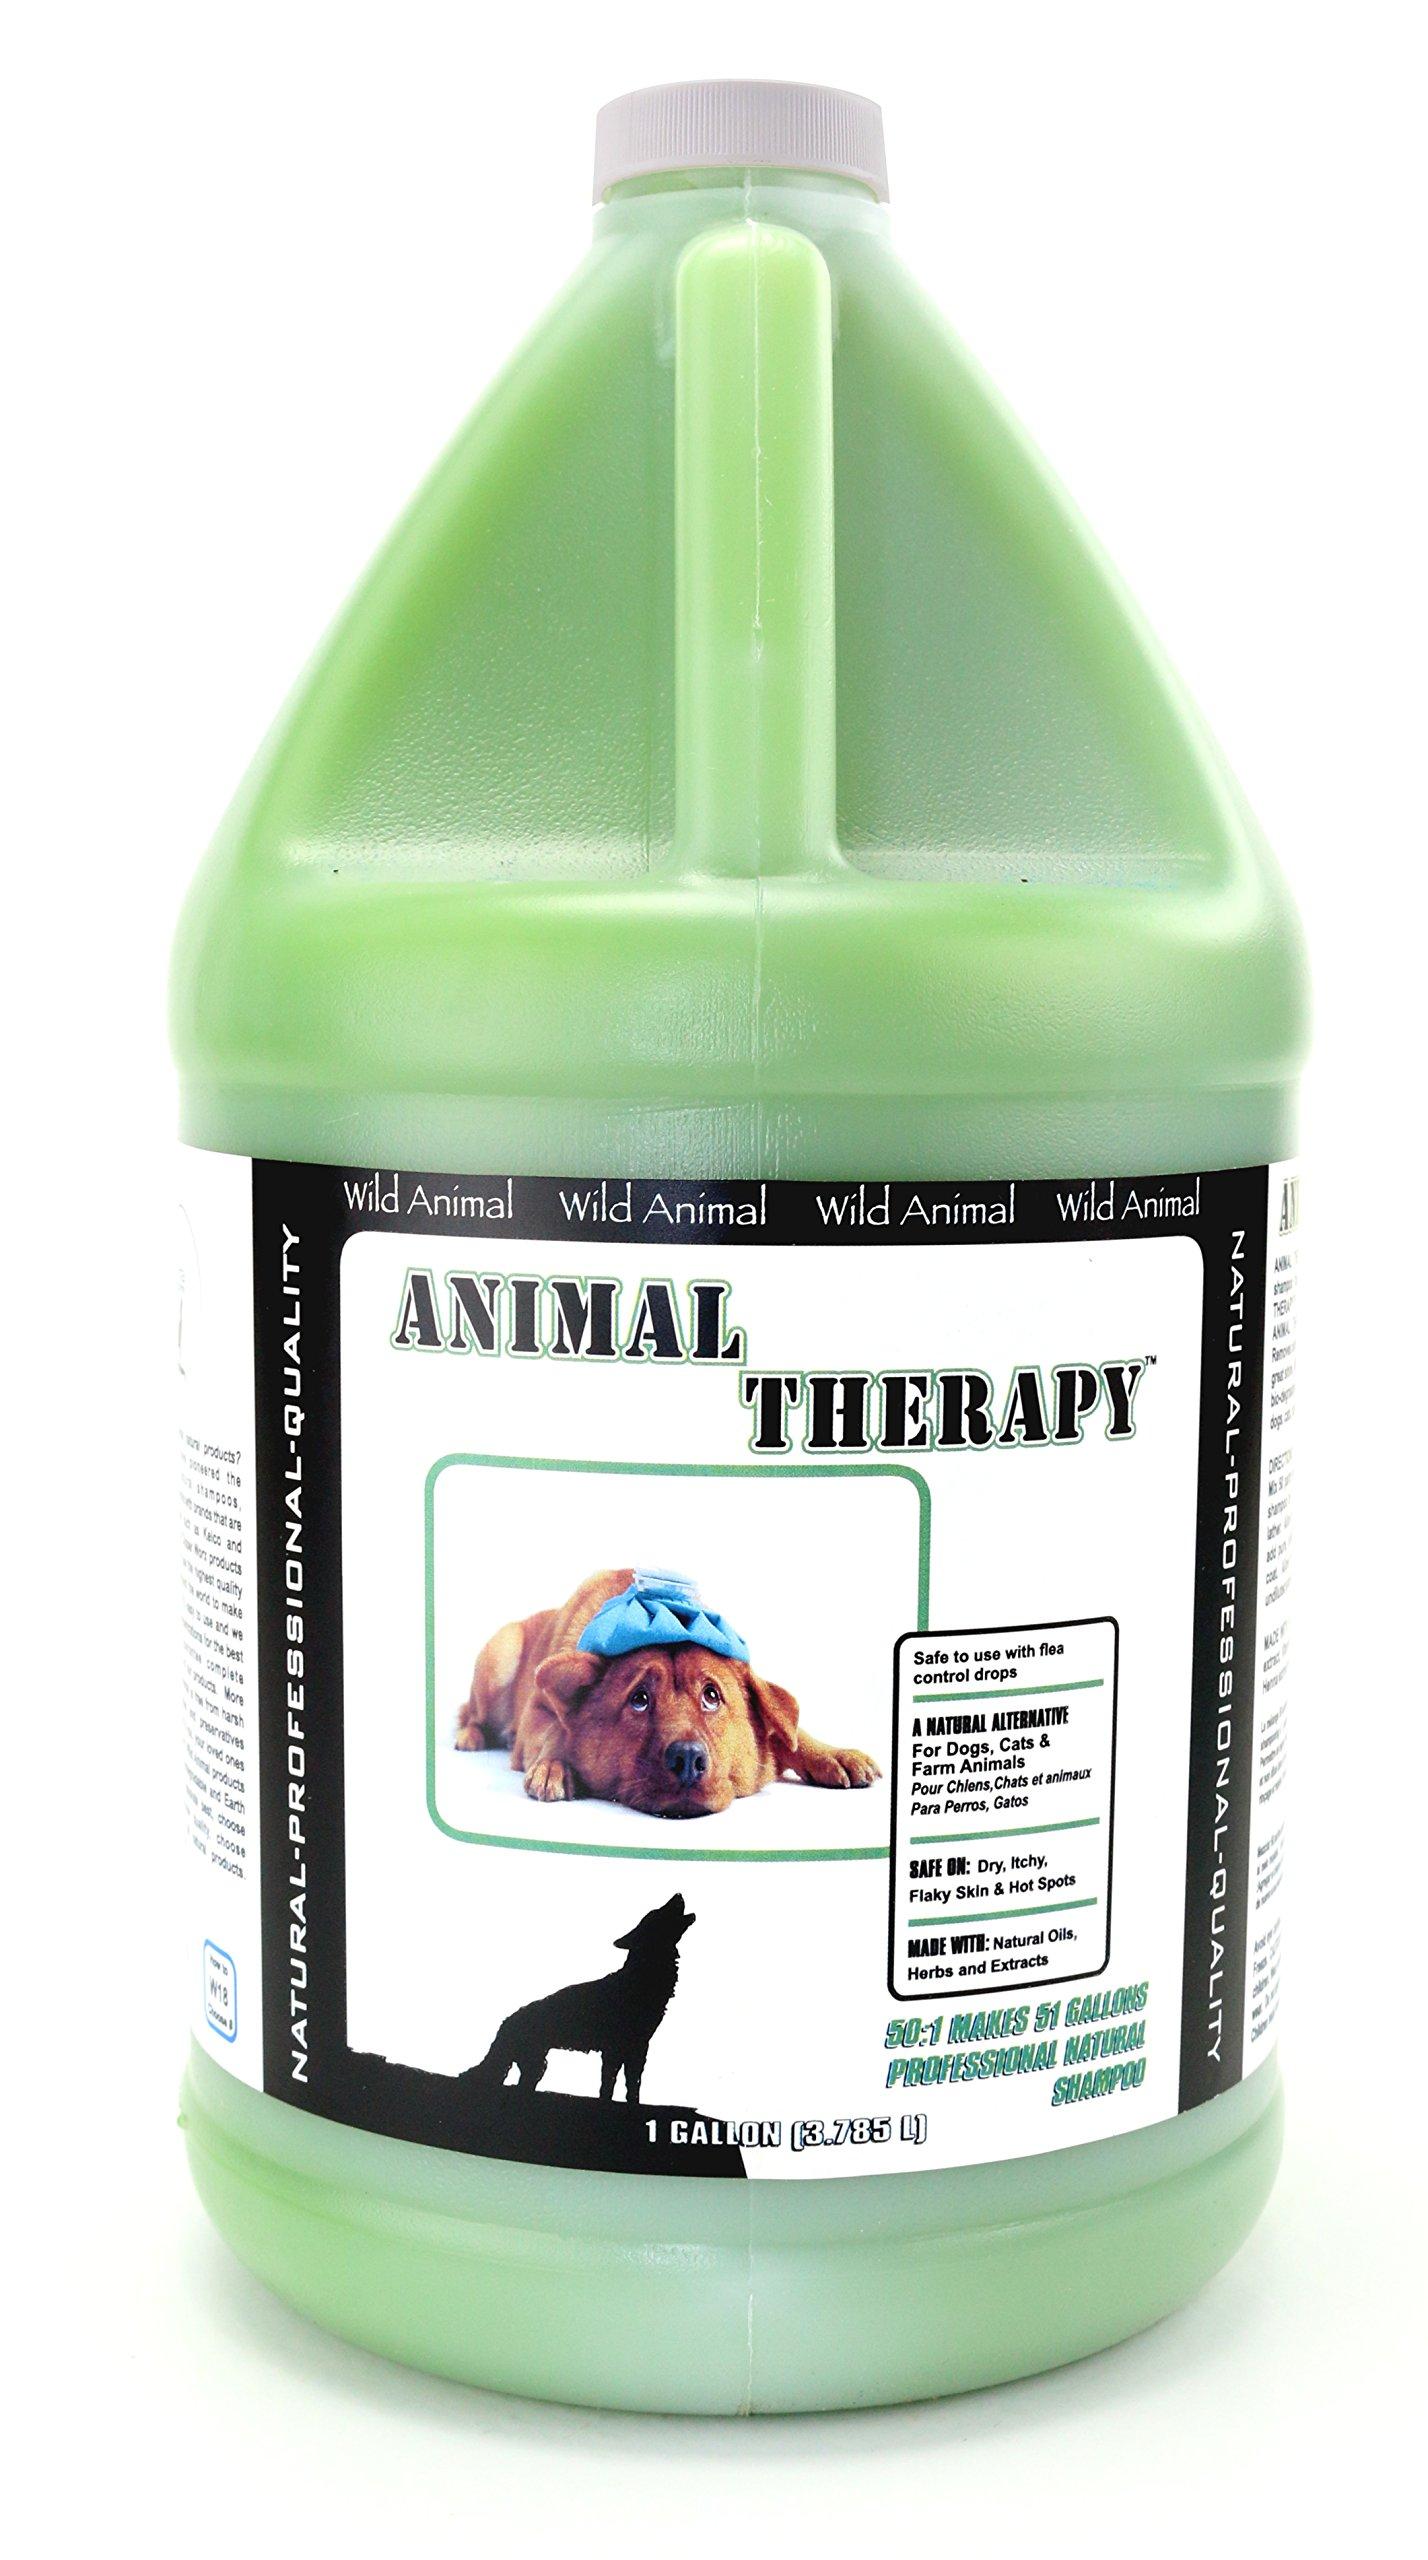 Wild Animal Animal Therapy 50:1 Shampoo, Gallon